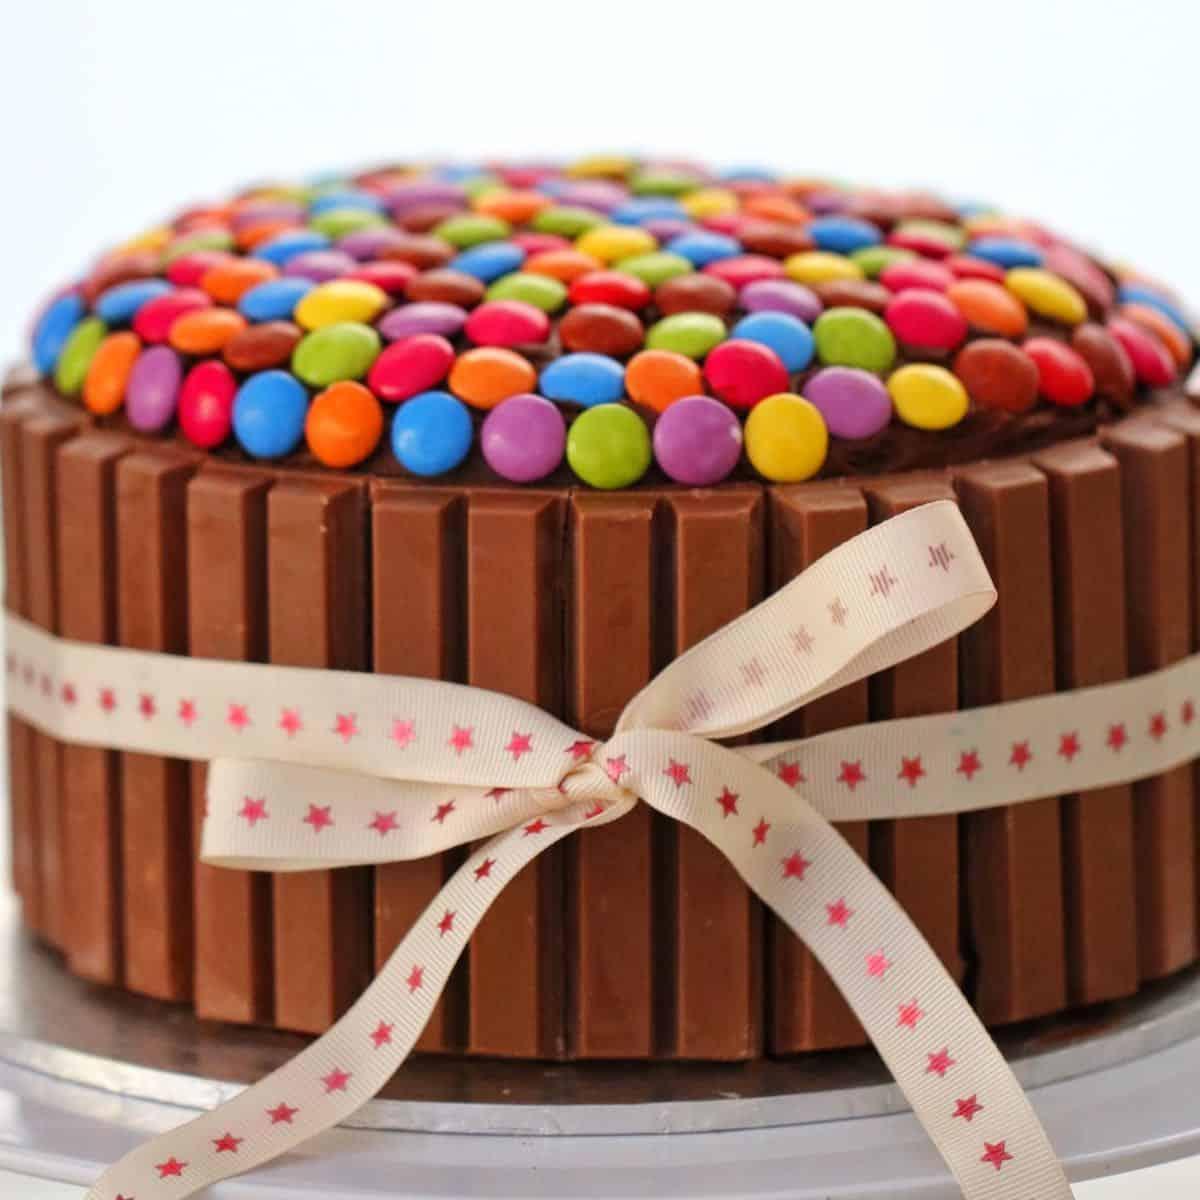 Thermomix Chocolate Cake